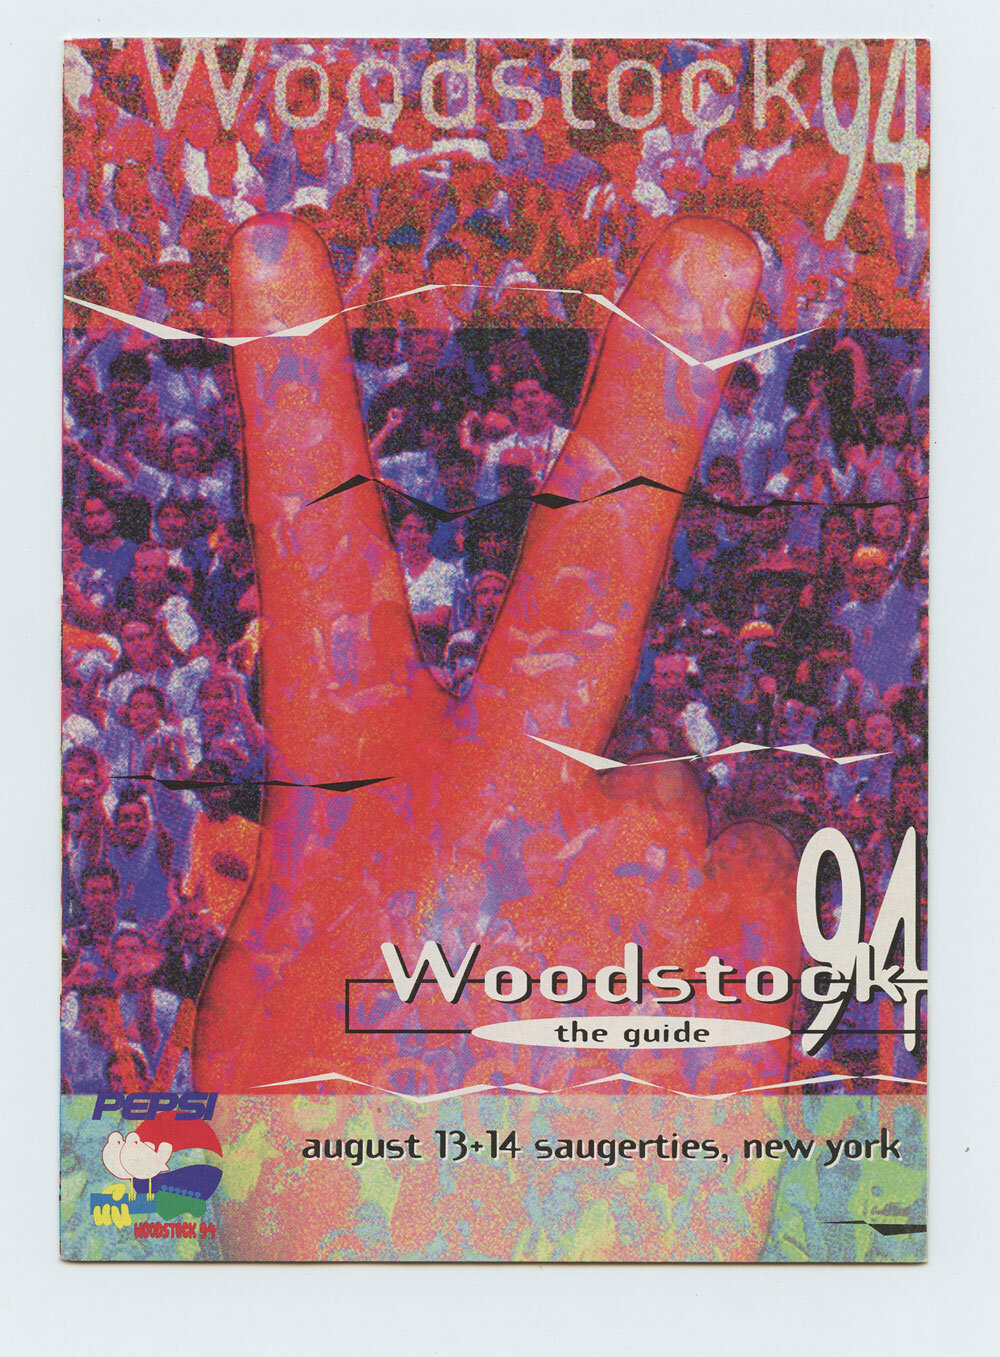 Woodstock 94 Program Guide Book 1994 Aug 13 Saugerties NY